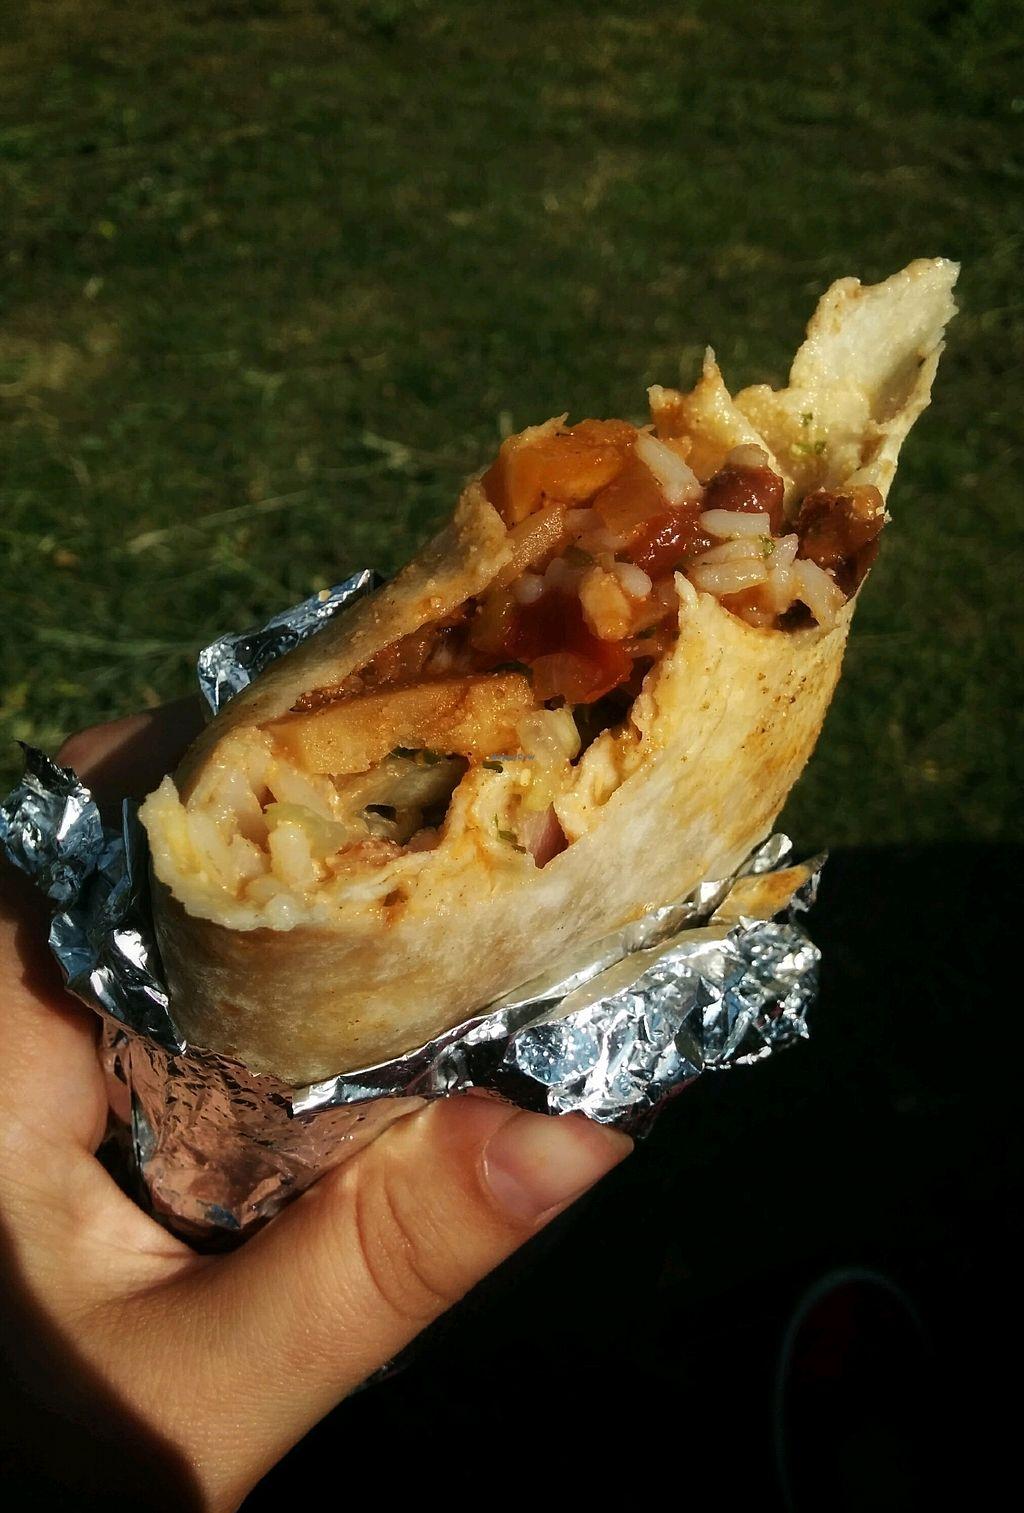 "Photo of Uno Mas  by <a href=""/members/profile/Pupnik"">Pupnik</a> <br/>Jackfruit burrito <br/> November 16, 2017  - <a href='/contact/abuse/image/102539/326264'>Report</a>"